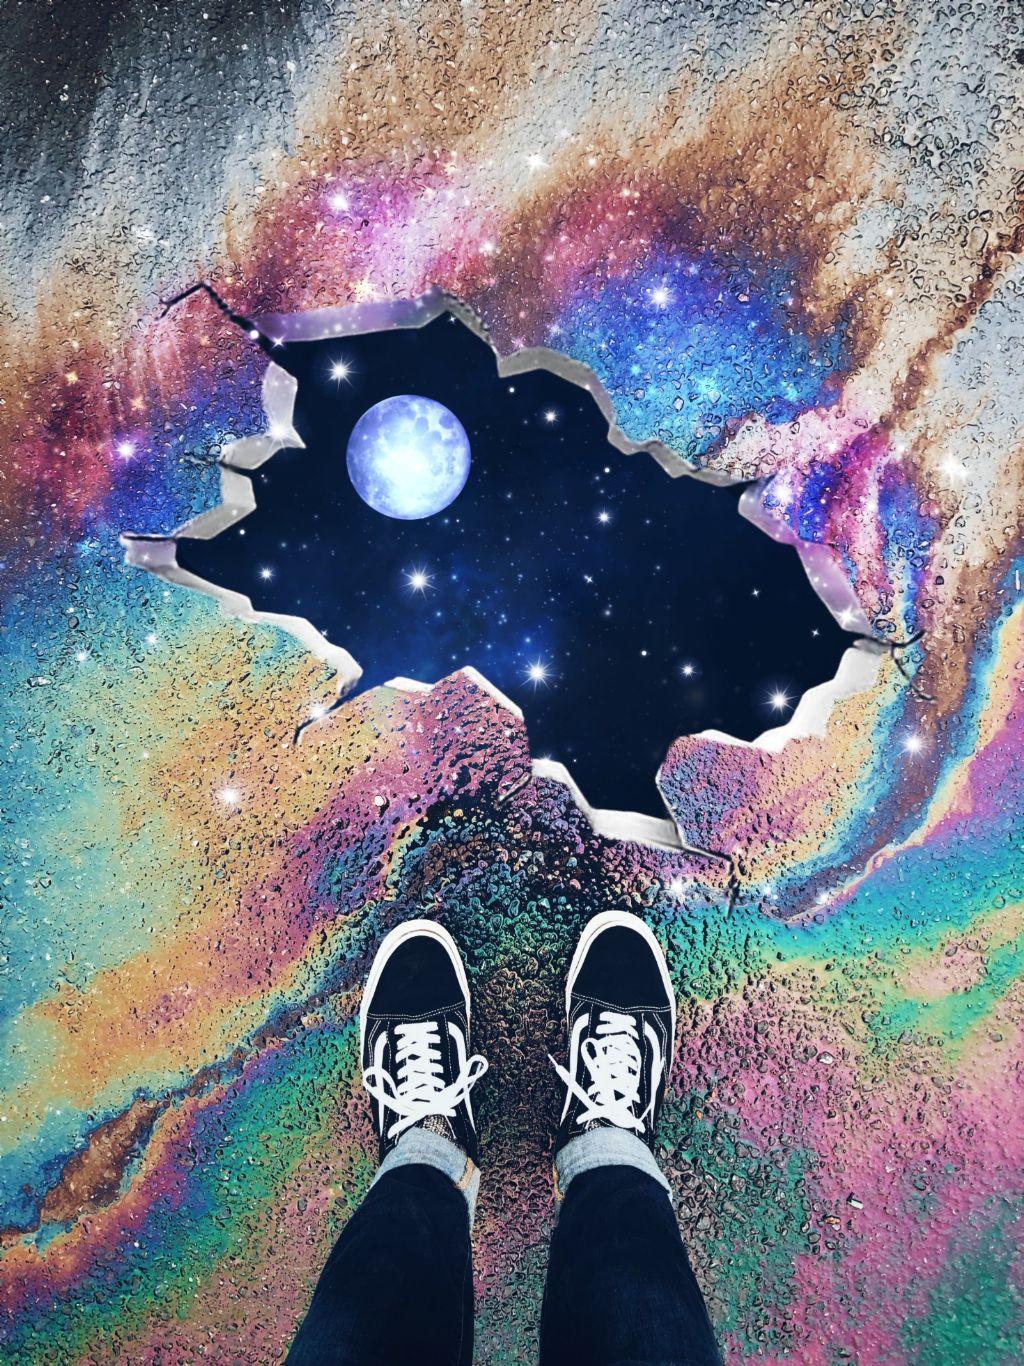 #freetoedit #universe #moon #colorful #madewithpicsart #surreal #dodgereffect #sparklelightbrush #galaxybrush